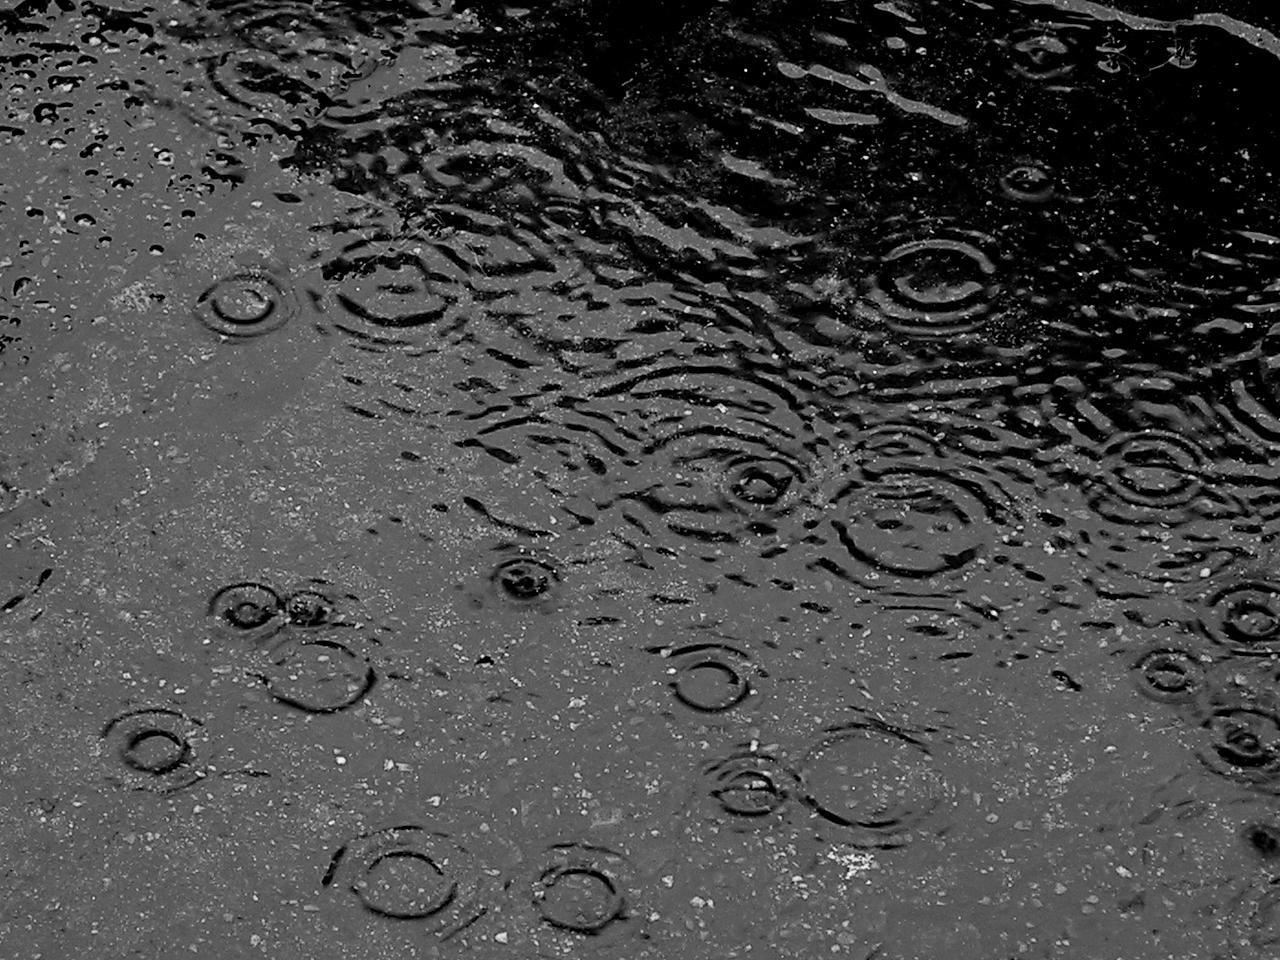 interpretare, vis, fenomen, natural, soare, ploaie, furtuna, ninsoare, vant, grindina, fulger, tunet, cutremur, curcubeu